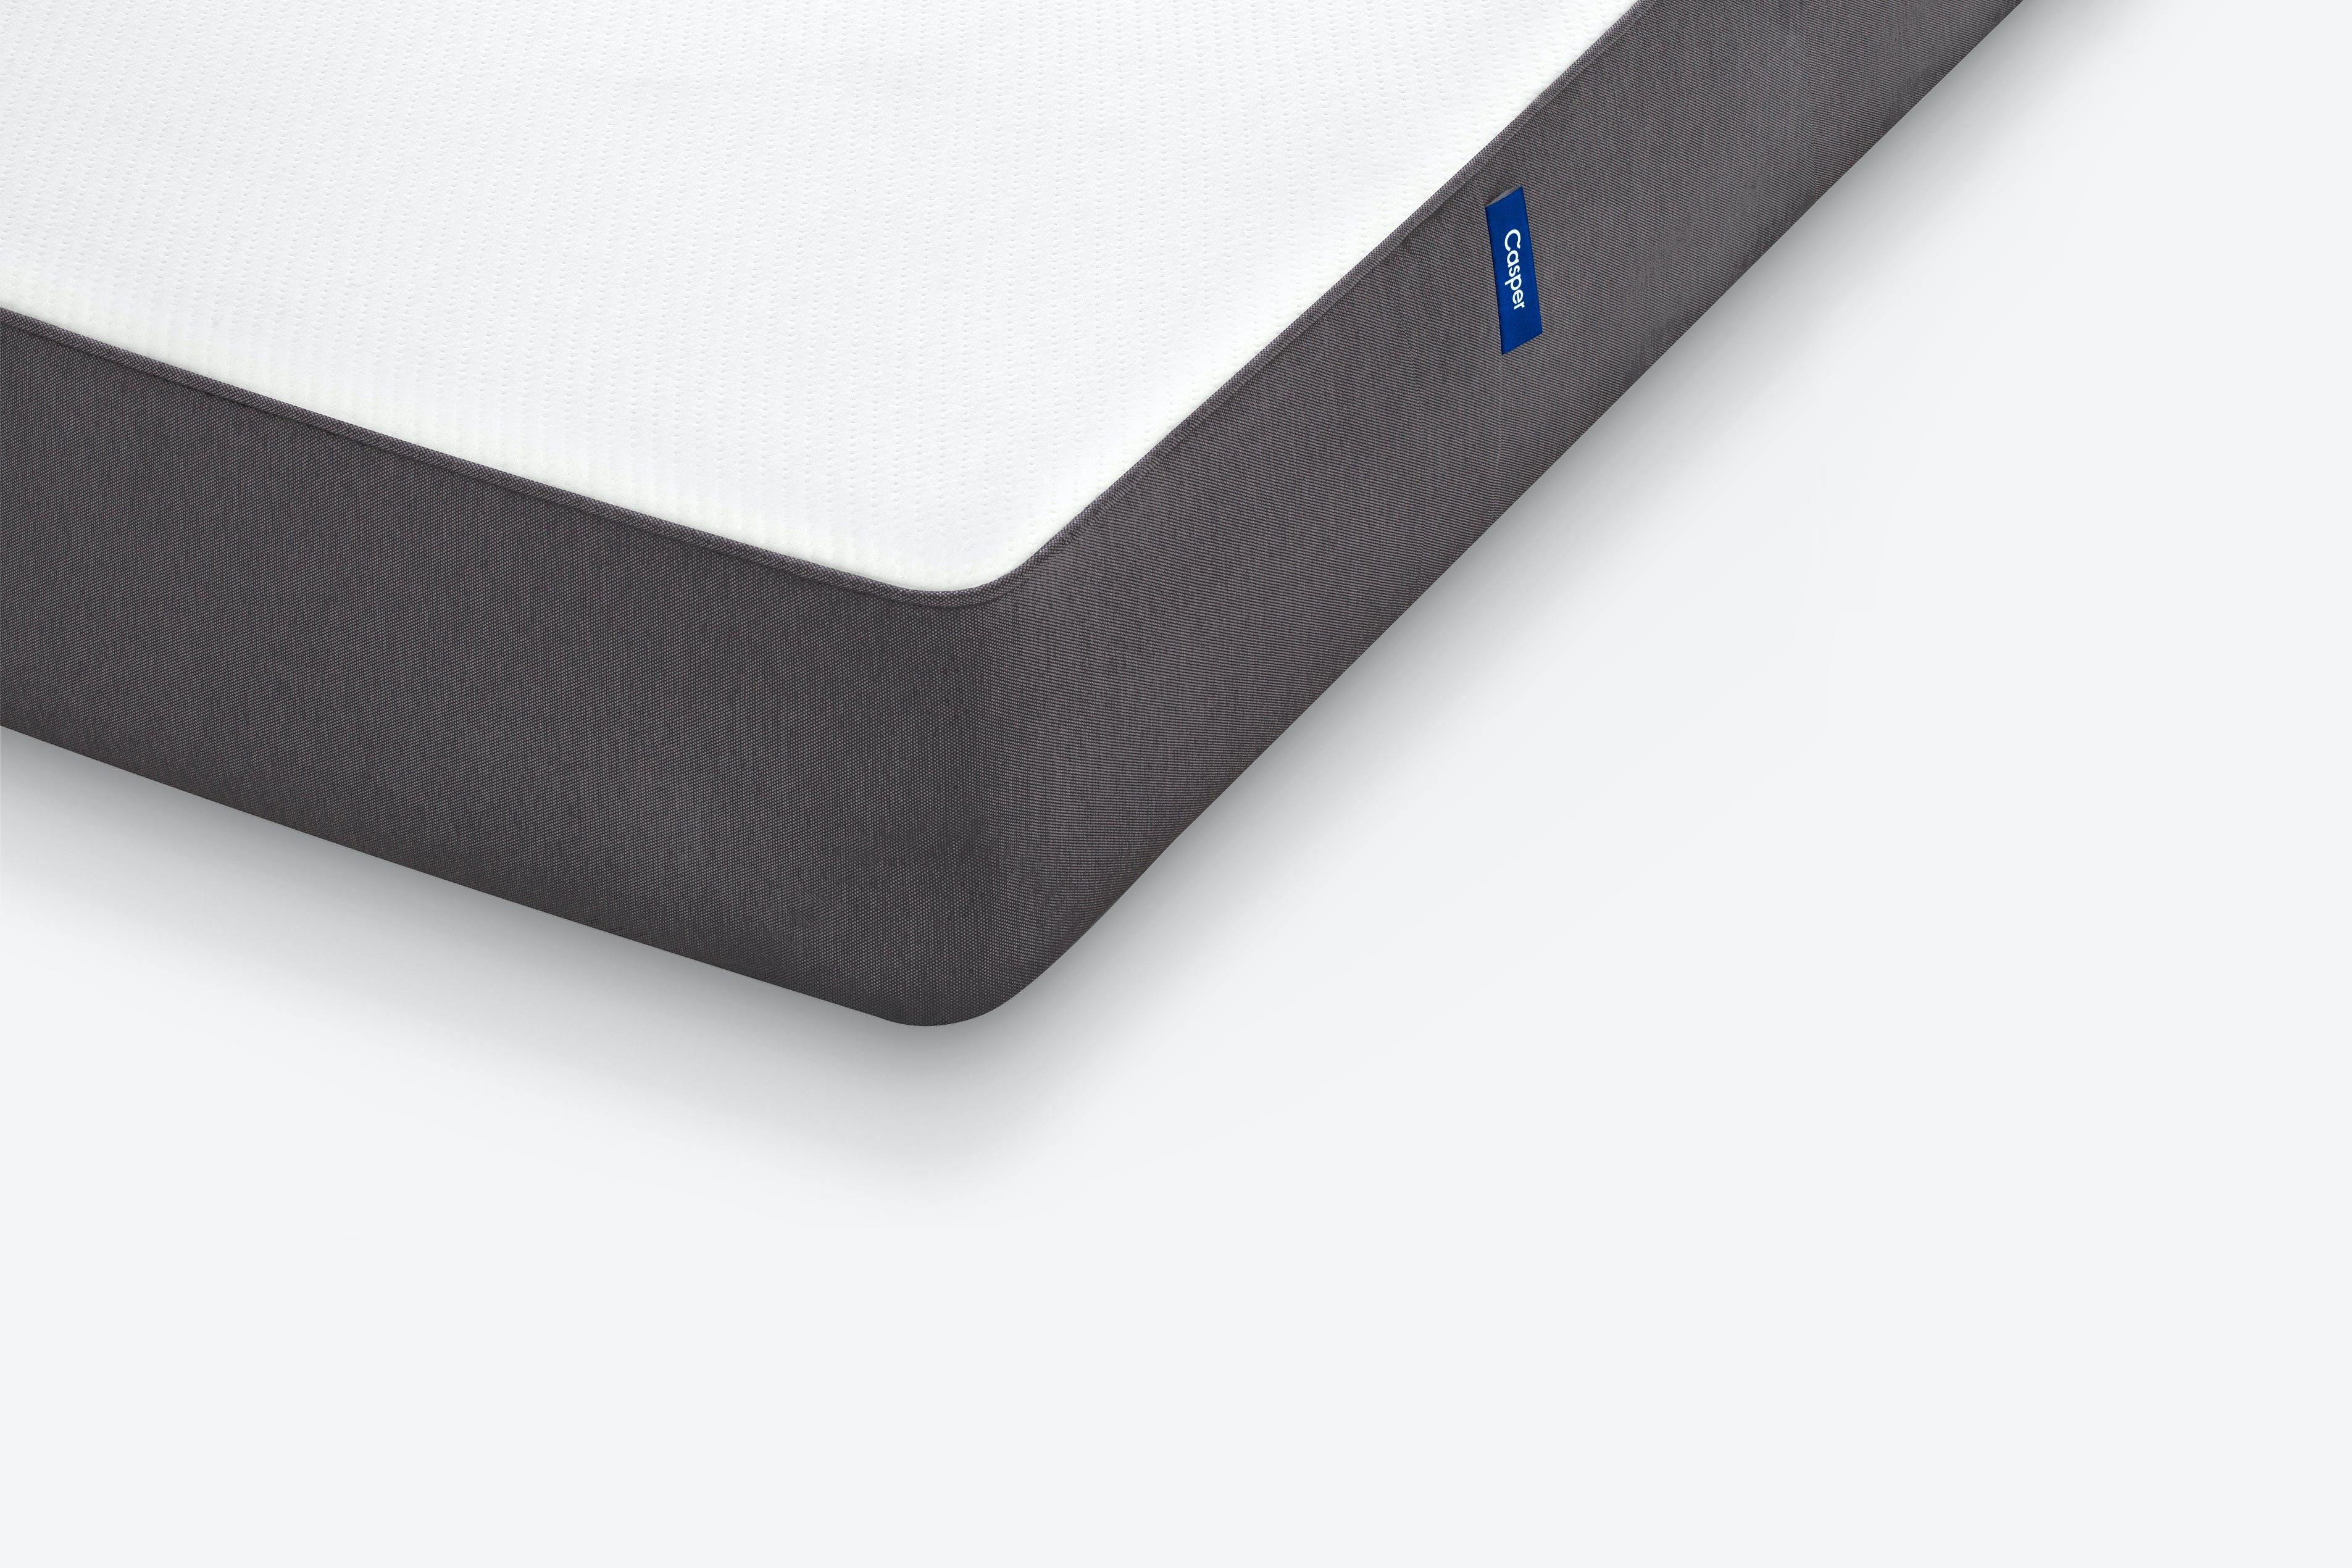 Casper mattress corner